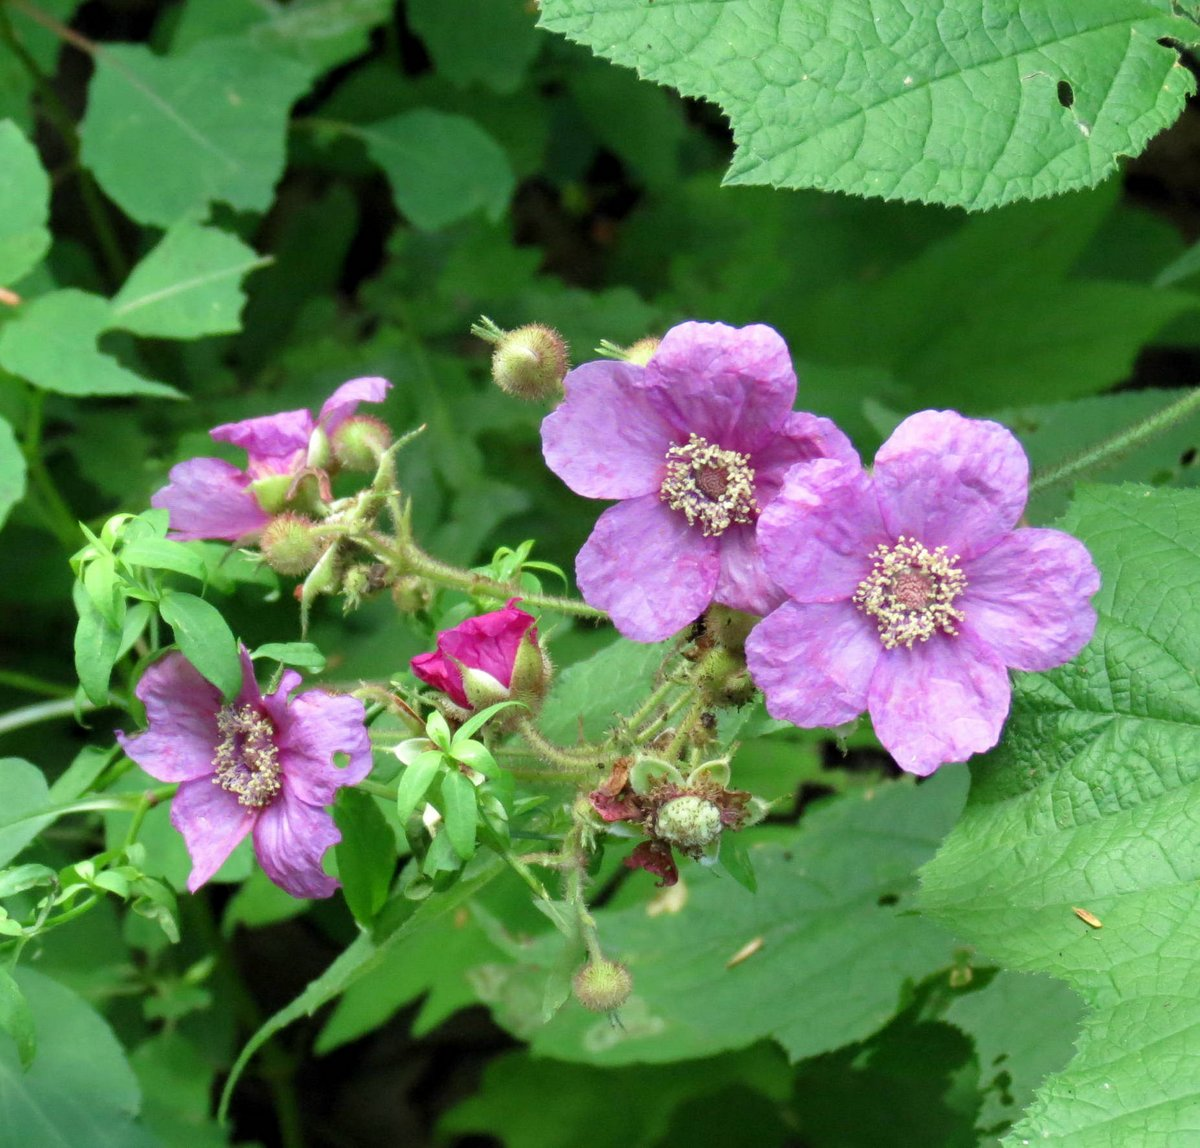 9. Purple Flowering Raspberry